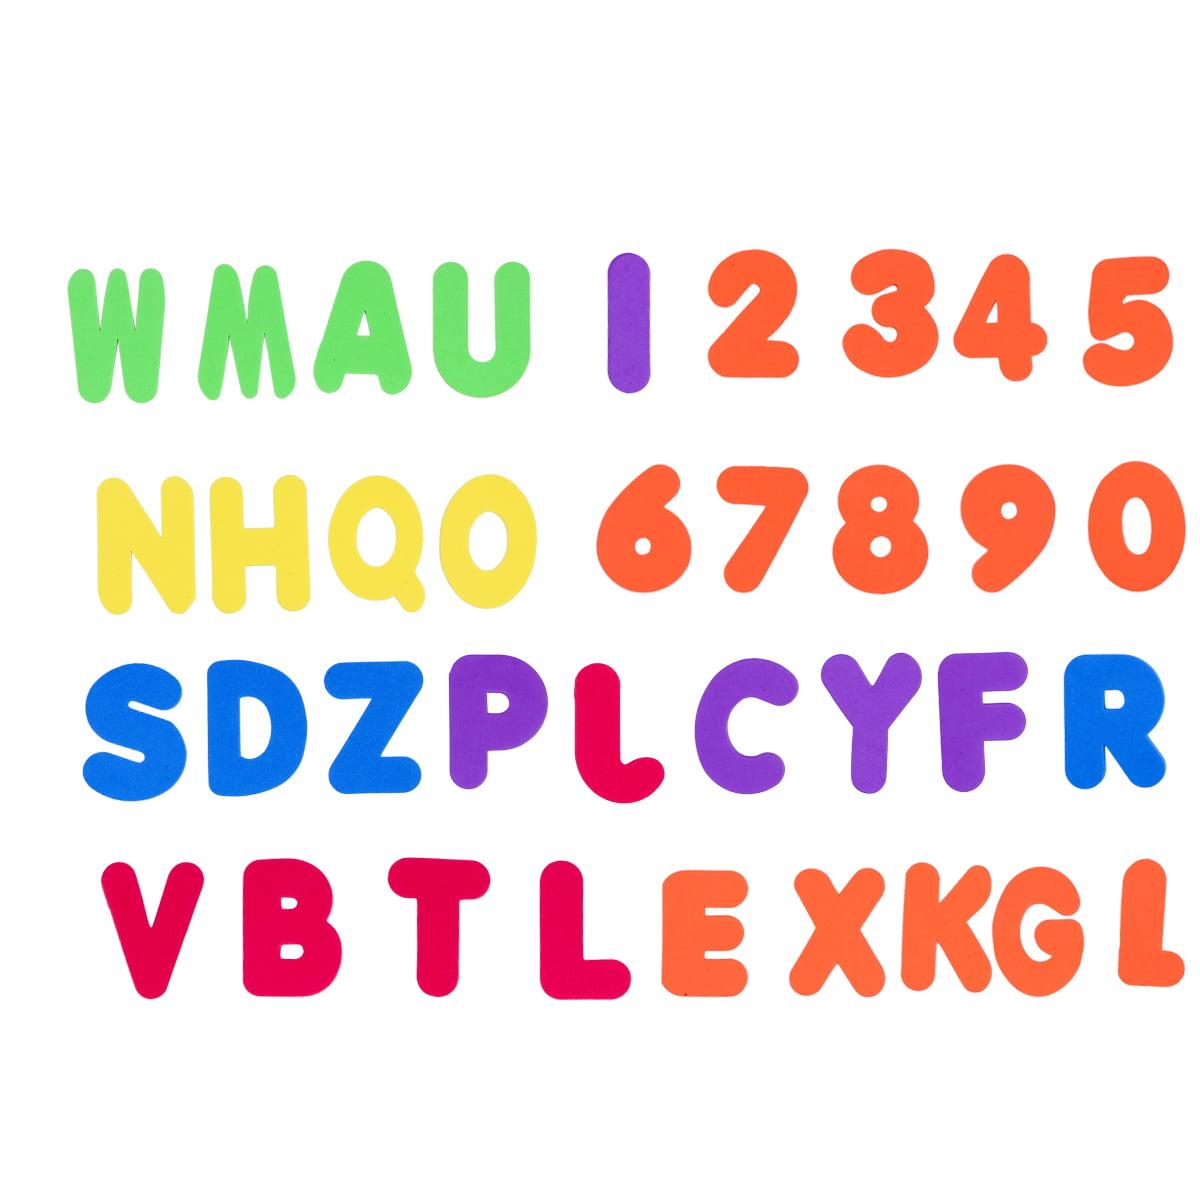 36 Pcs Set Foam Bath Alphabet Letters and Numbers Bath Toy Organizer Non Toxic EVA Foam... by